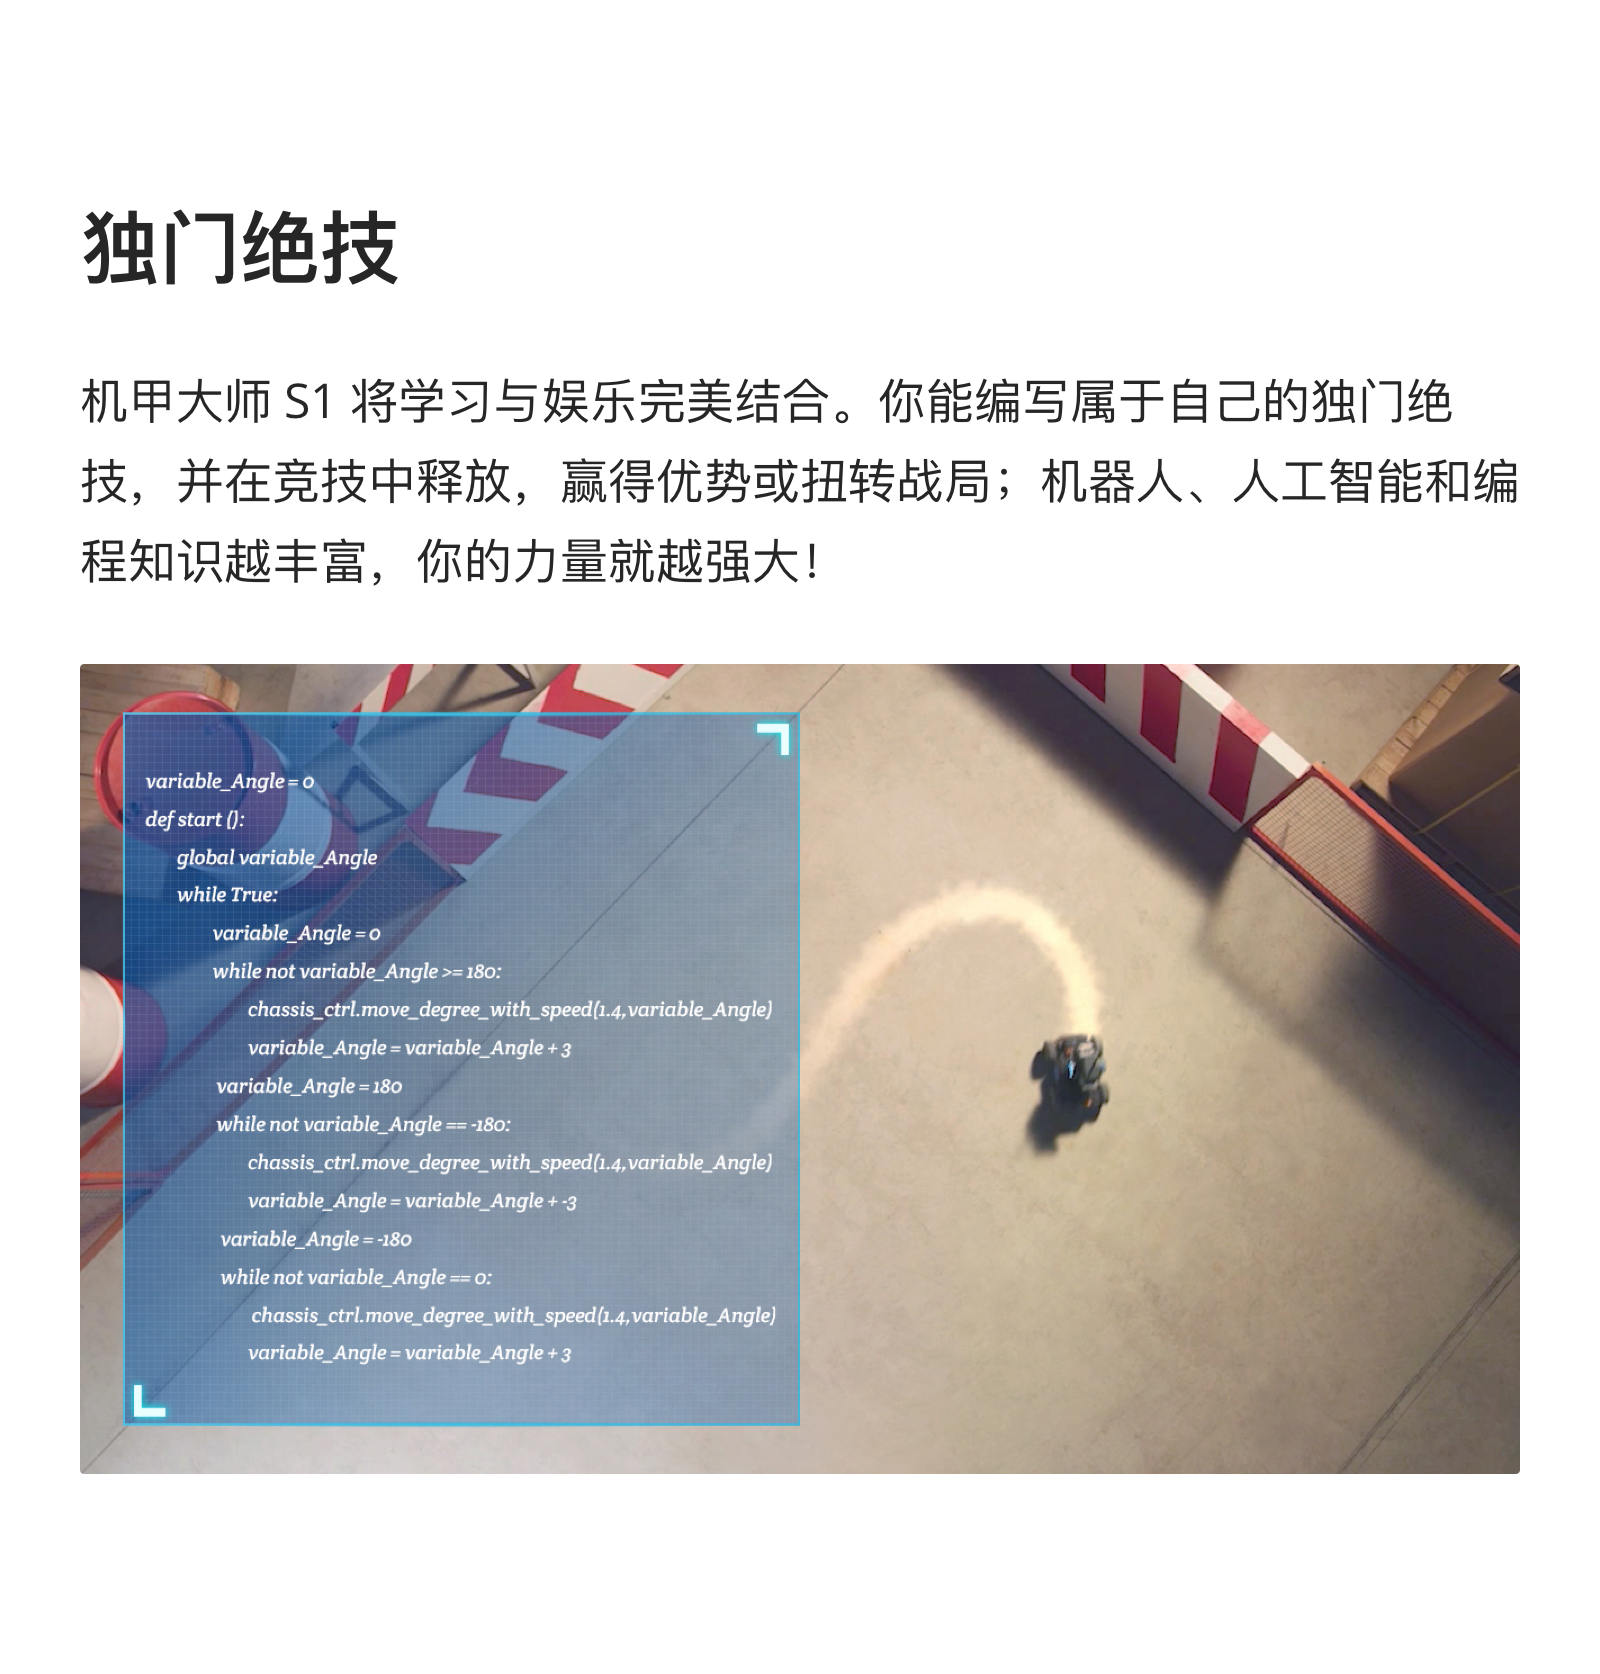 0607_store_PC_cn_10@2x.jpg